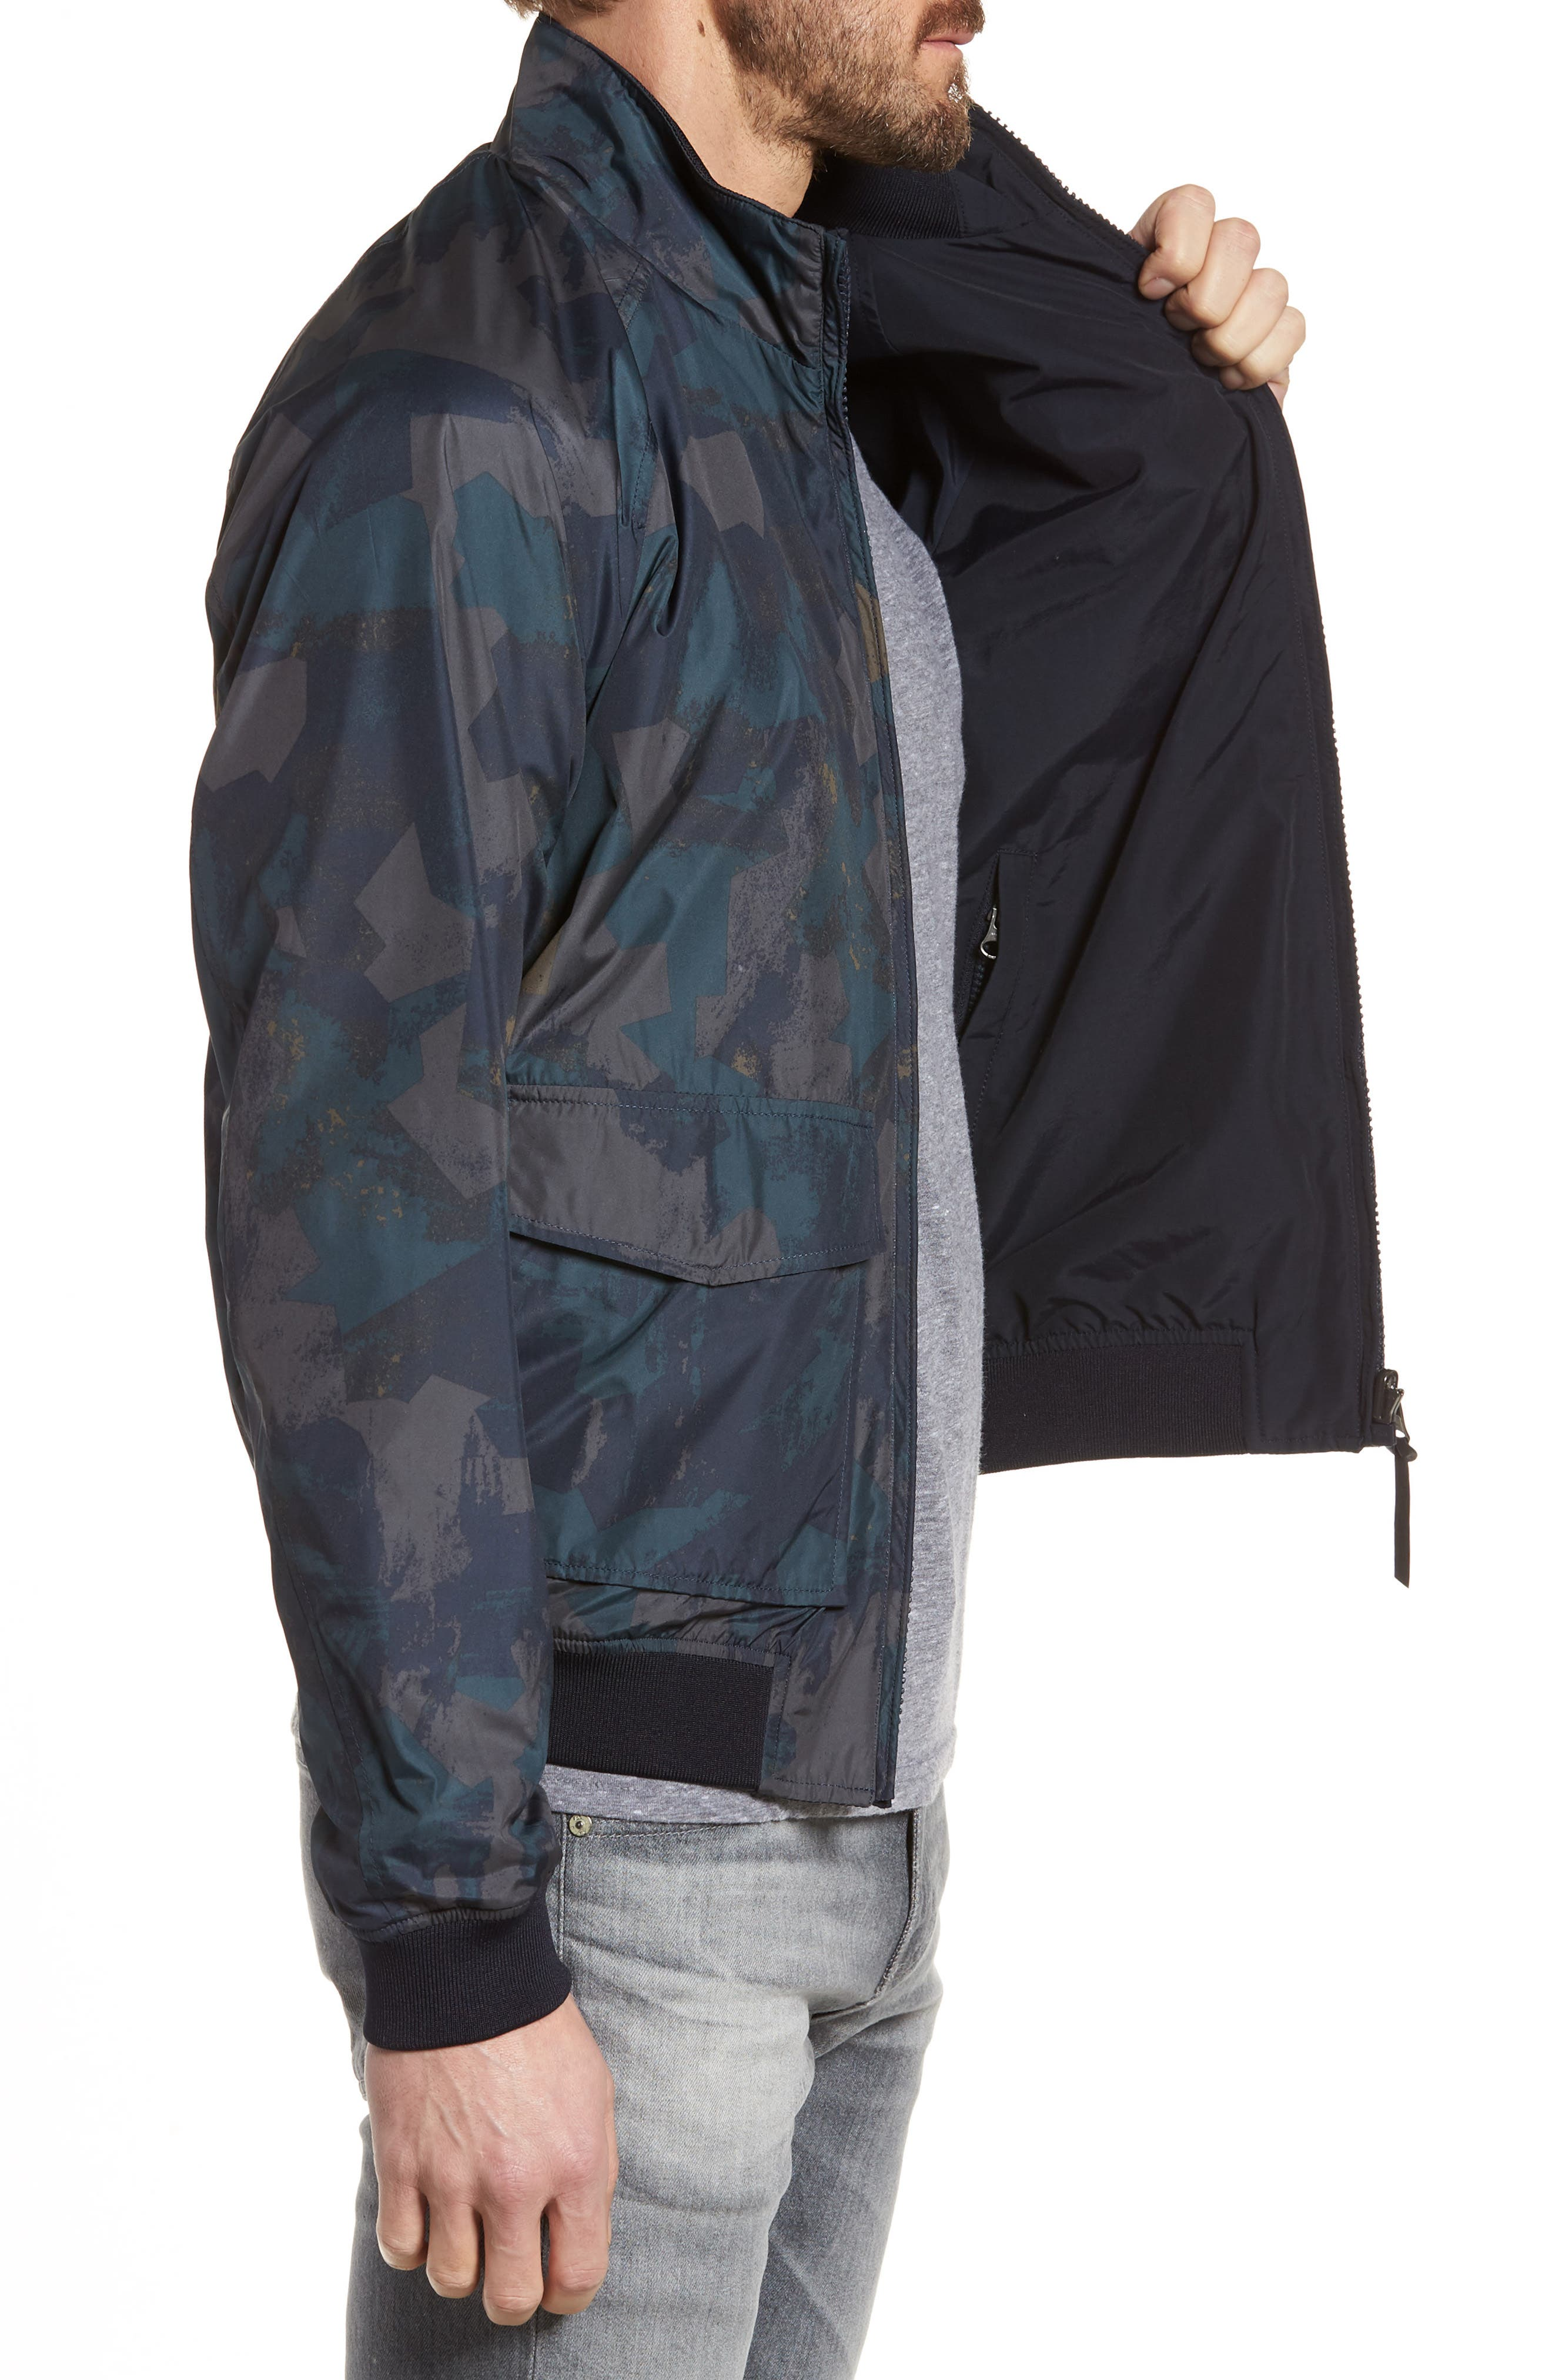 & Bros. Shore Reversible Bomber Jacket,                             Alternate thumbnail 3, color,                             Melton Blue Camo